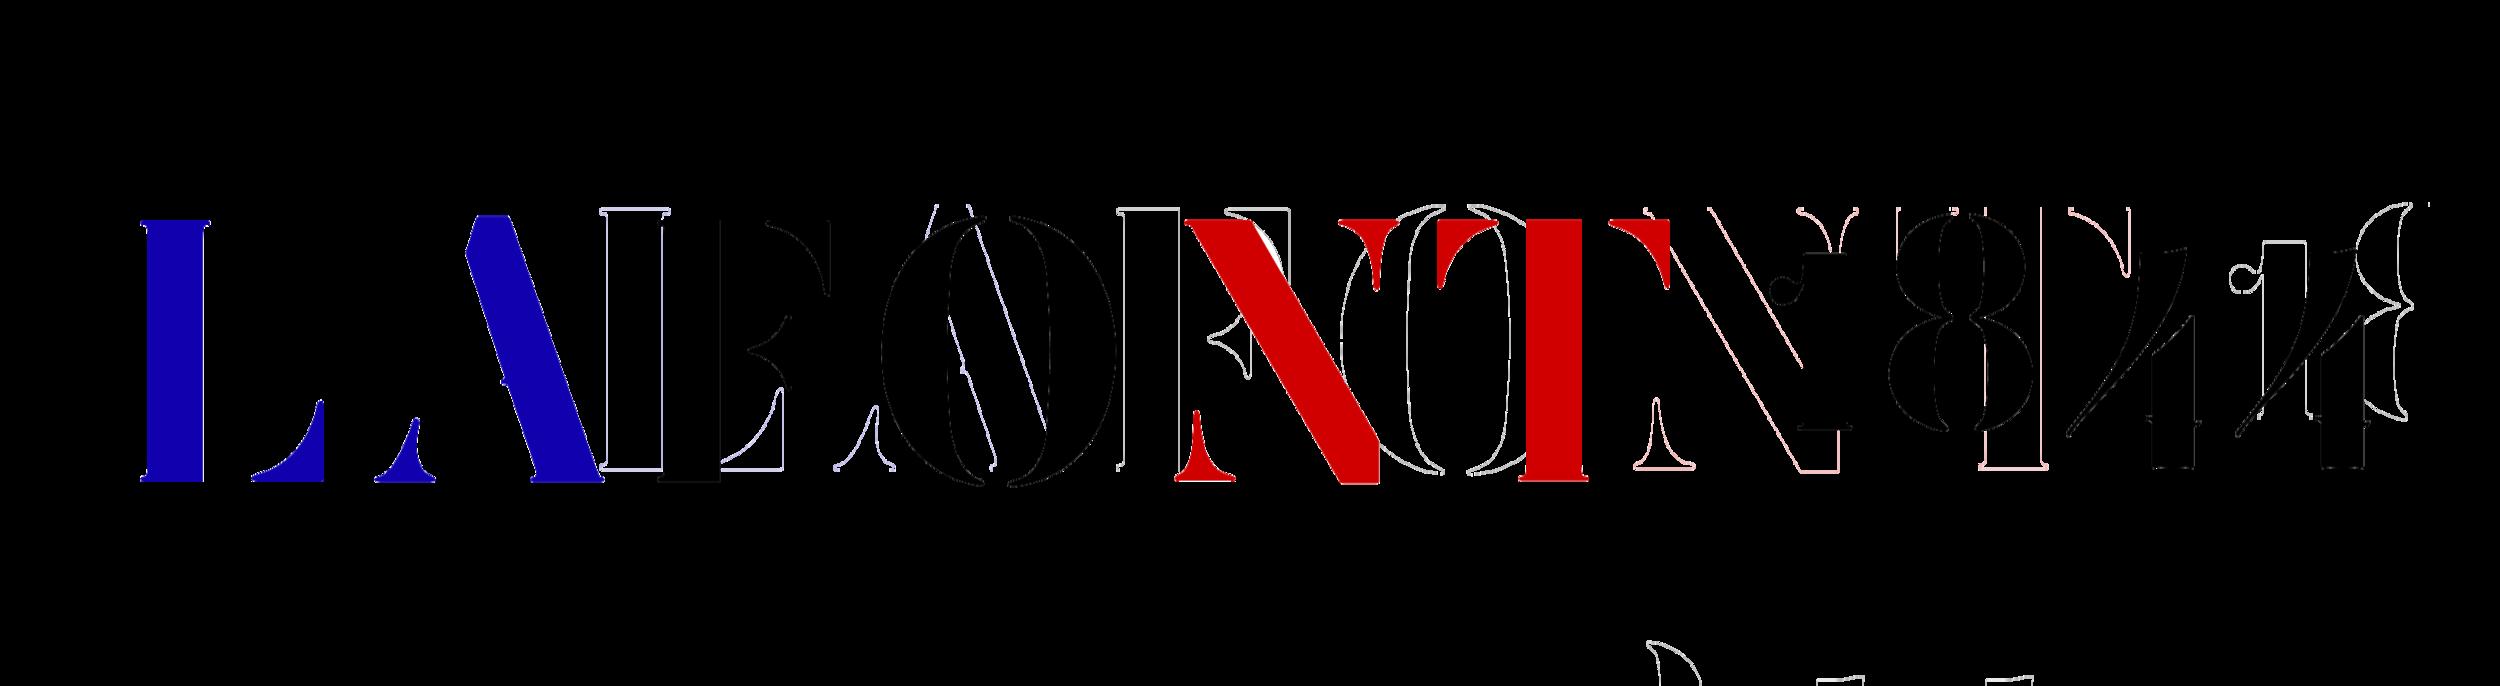 logo lafont2.png